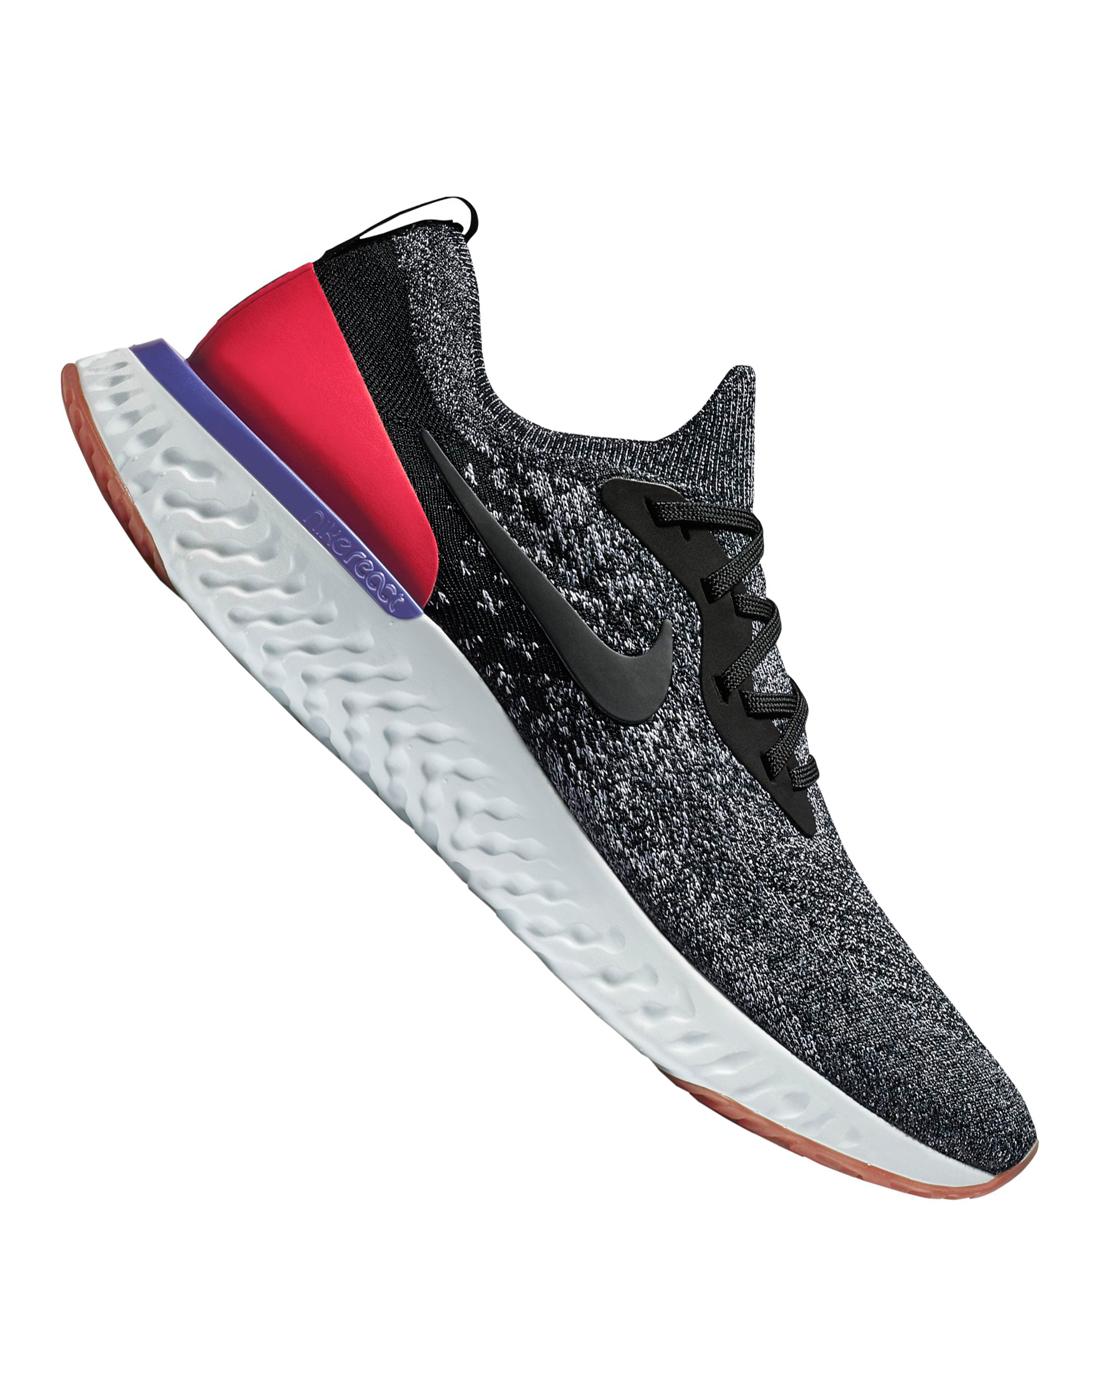 aea04adf8af4 Men s Nike React Running Shoes